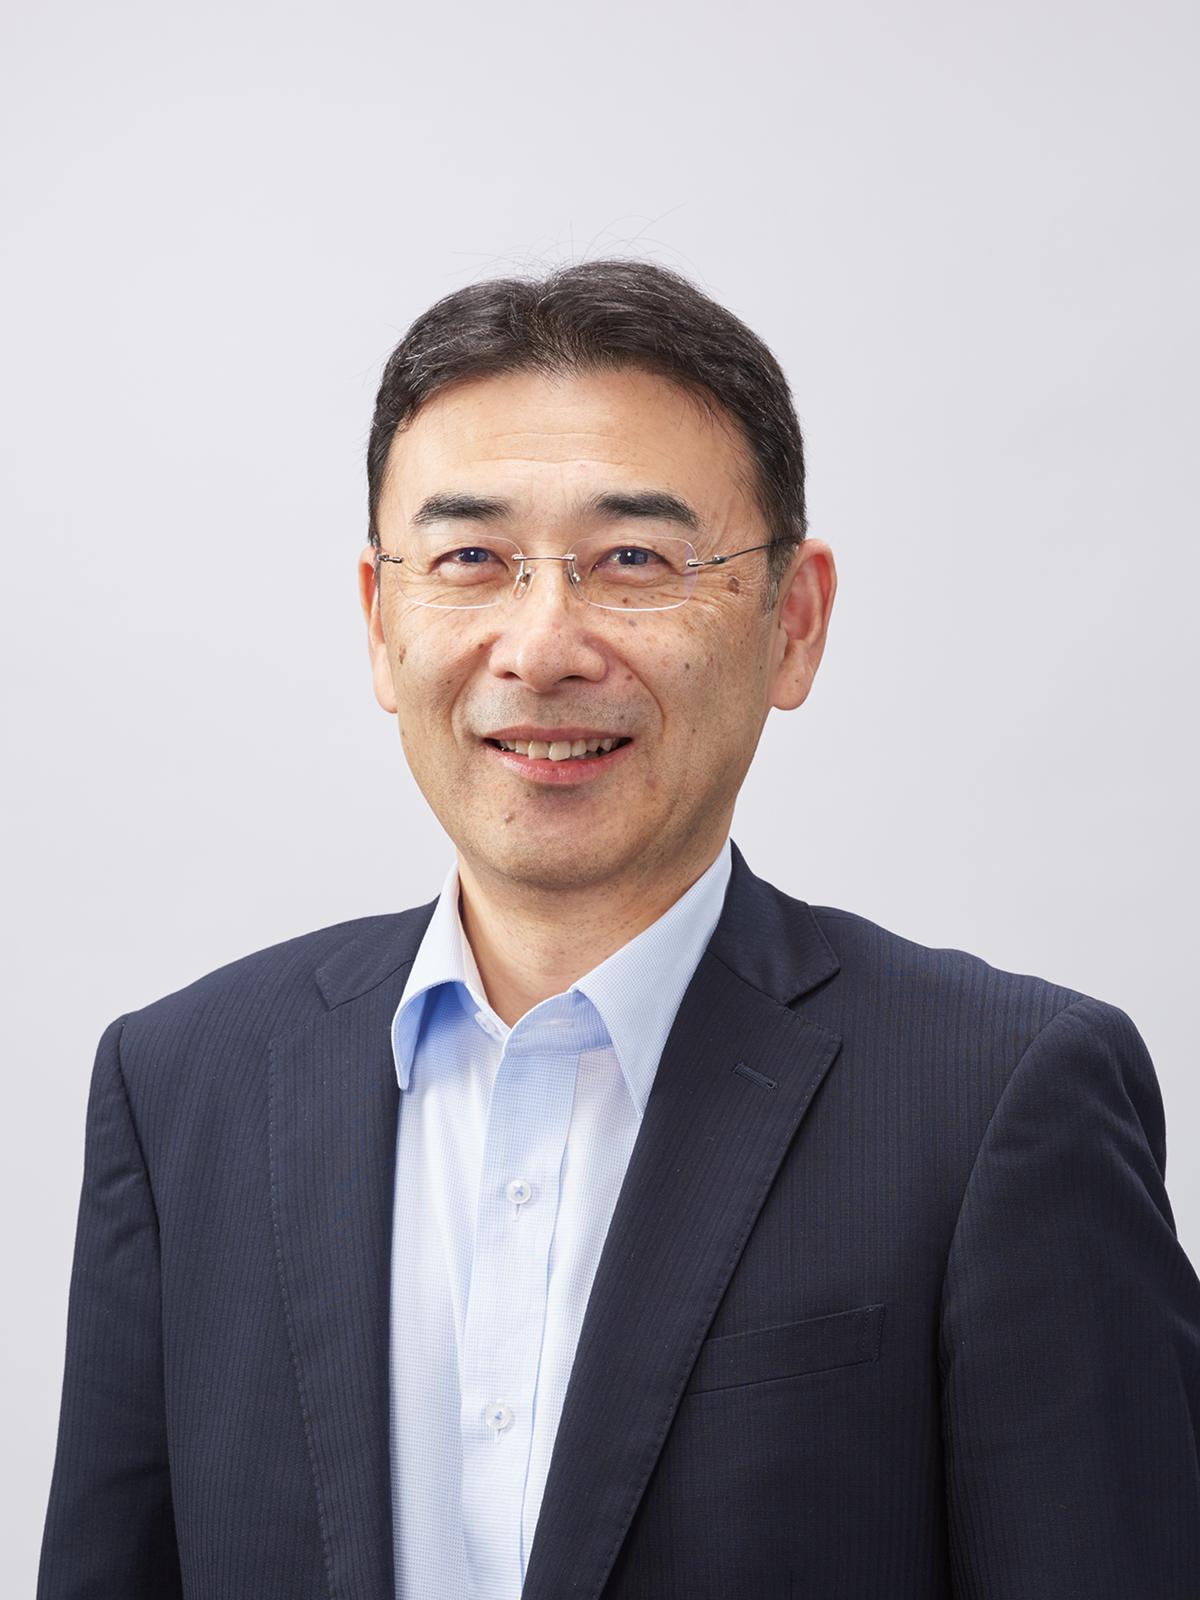 Arm オペレータソリューションズ ディレクター 清水章